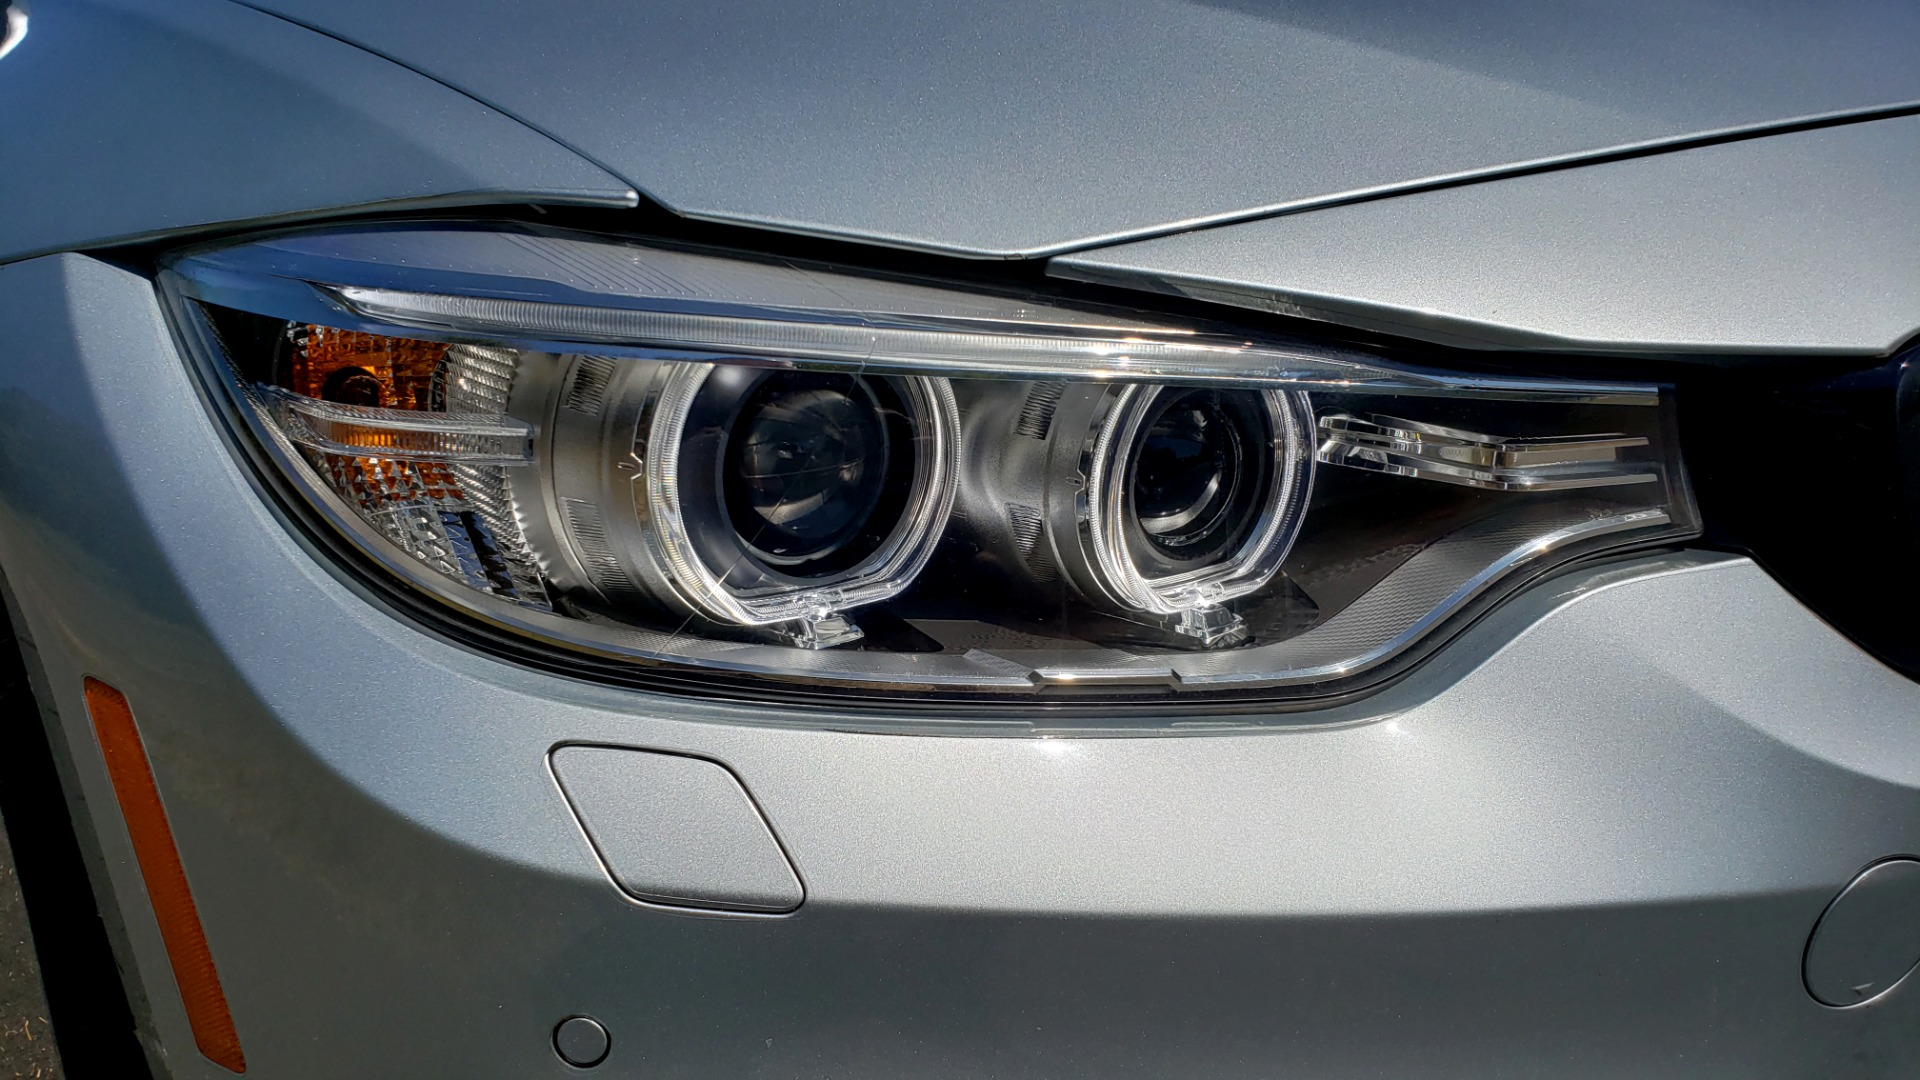 Used 2015 BMW M3 EXECUTIVE PKG / NAV / CAMERA / HUD / CARBON FIBER ROOF for sale Sold at Formula Imports in Charlotte NC 28227 9